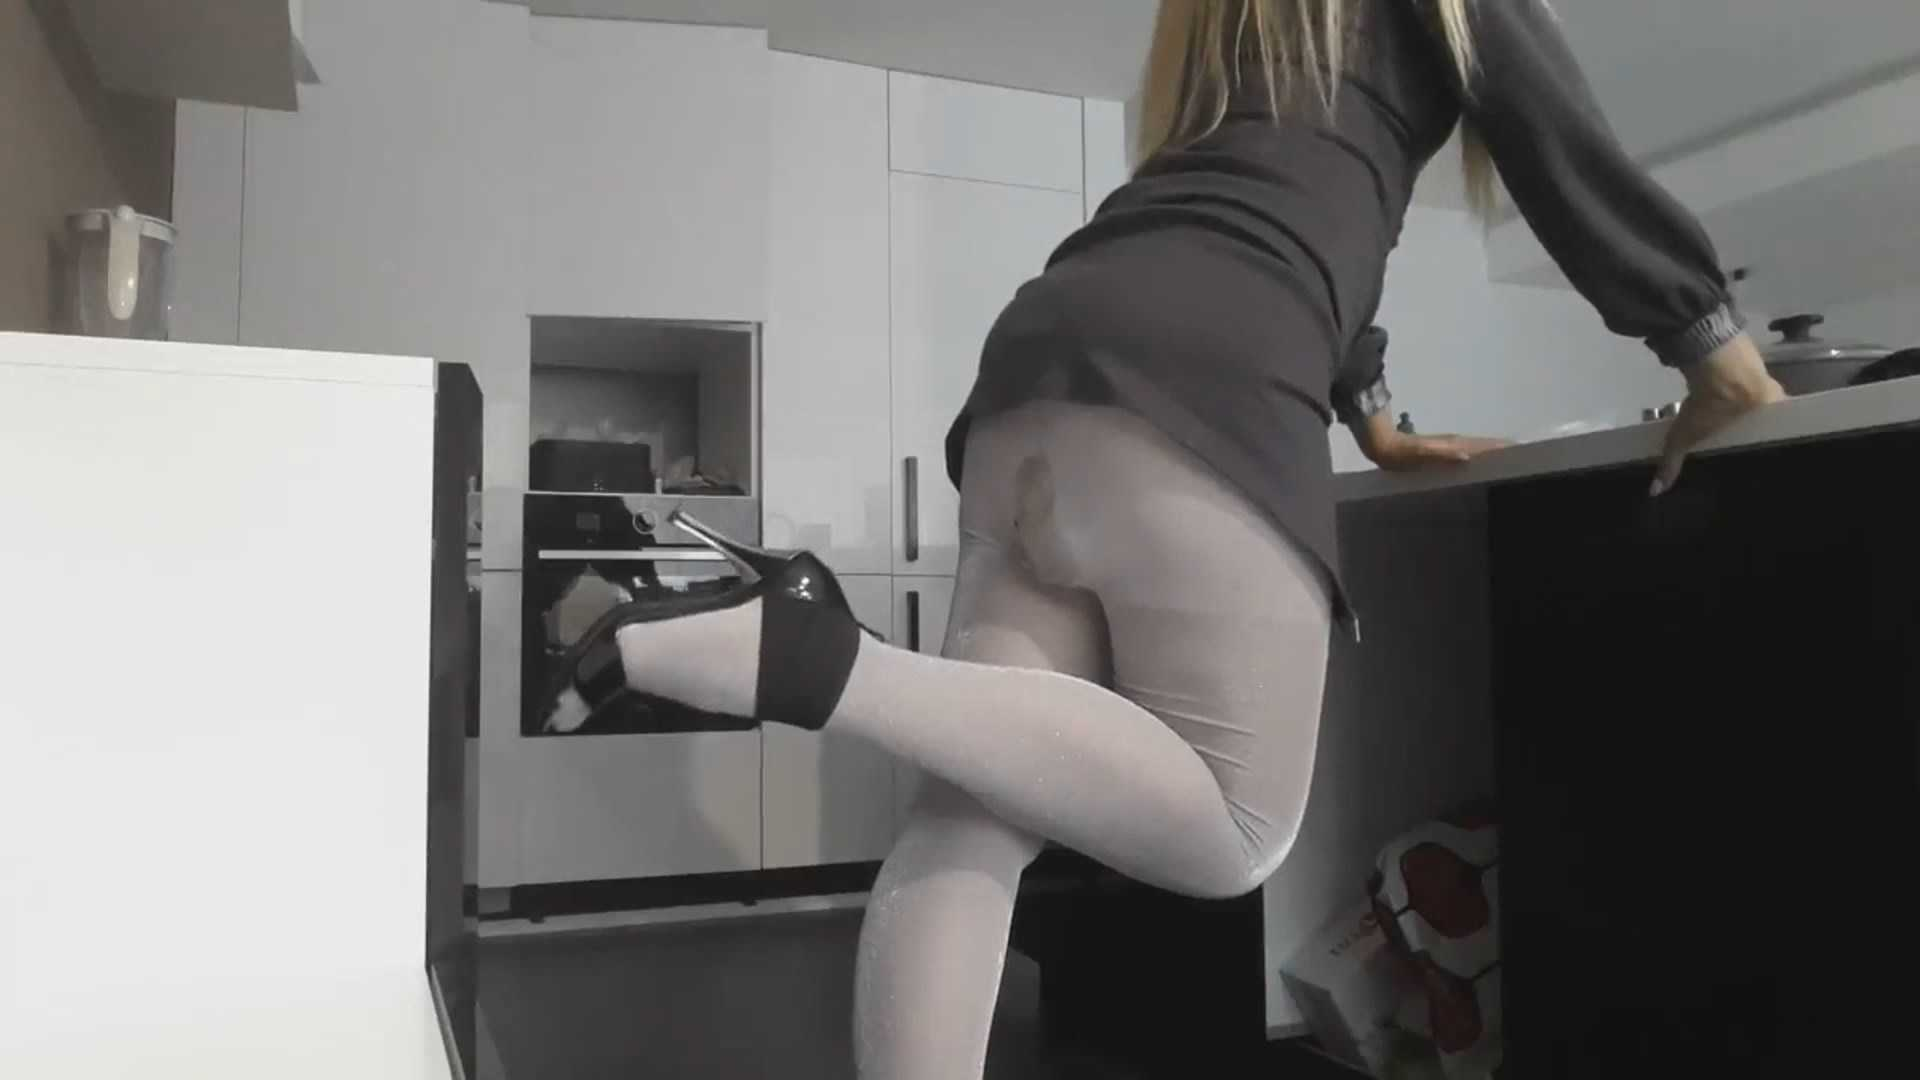 Office Pantyhose Poop – panthergodess   Full HD 1080p   August 3, 2017